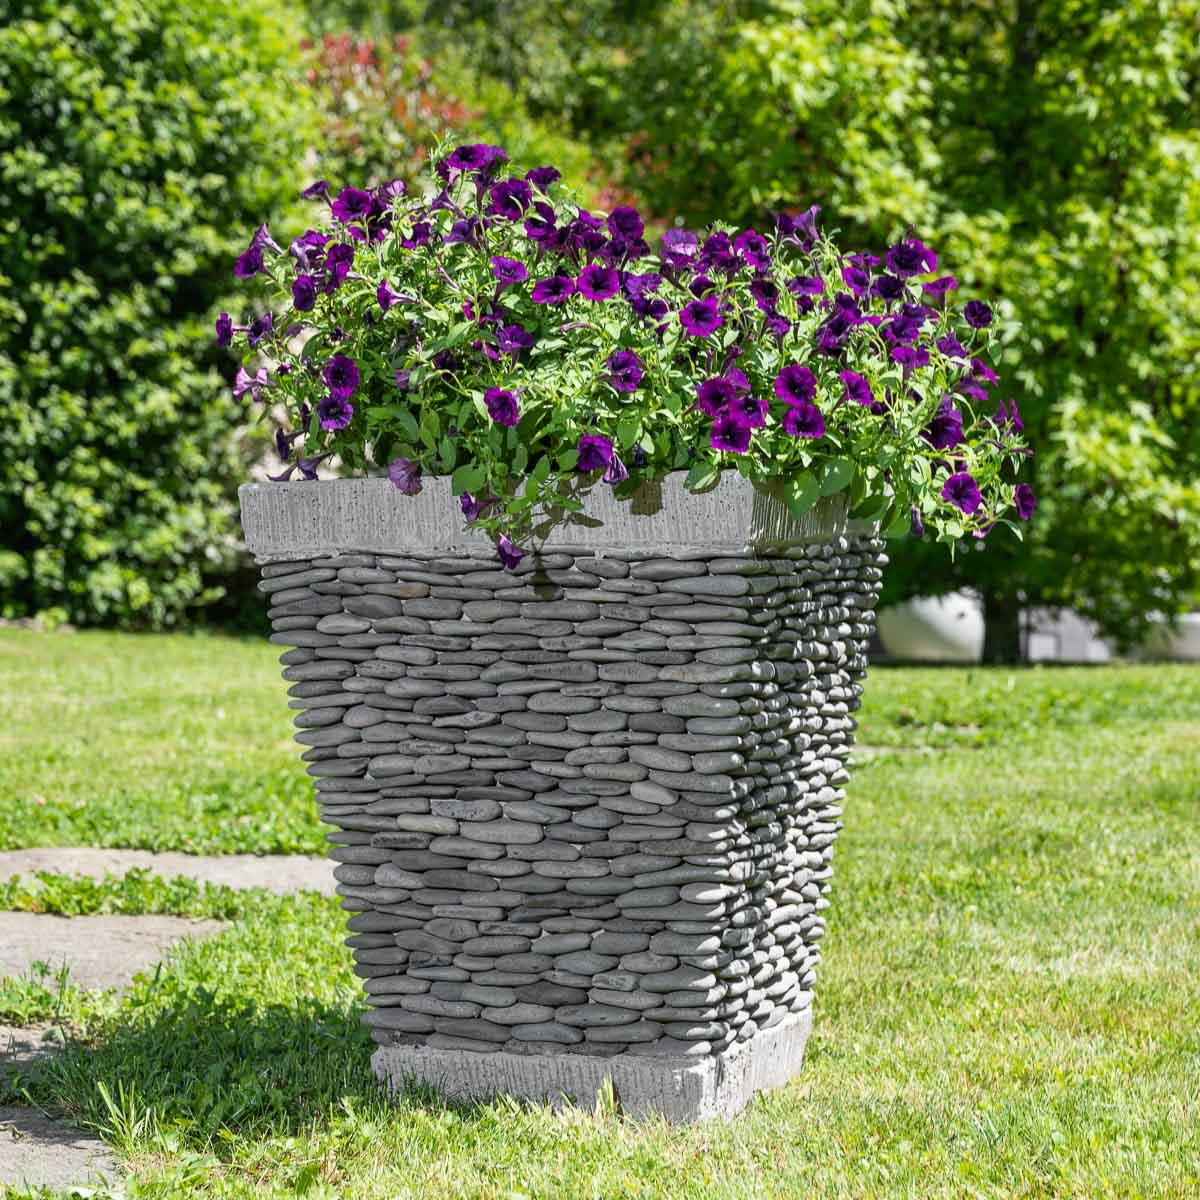 Maceta tiesto jardinera cuadrada piedra 50 cm jard n - Macetas para jardin exterior ...